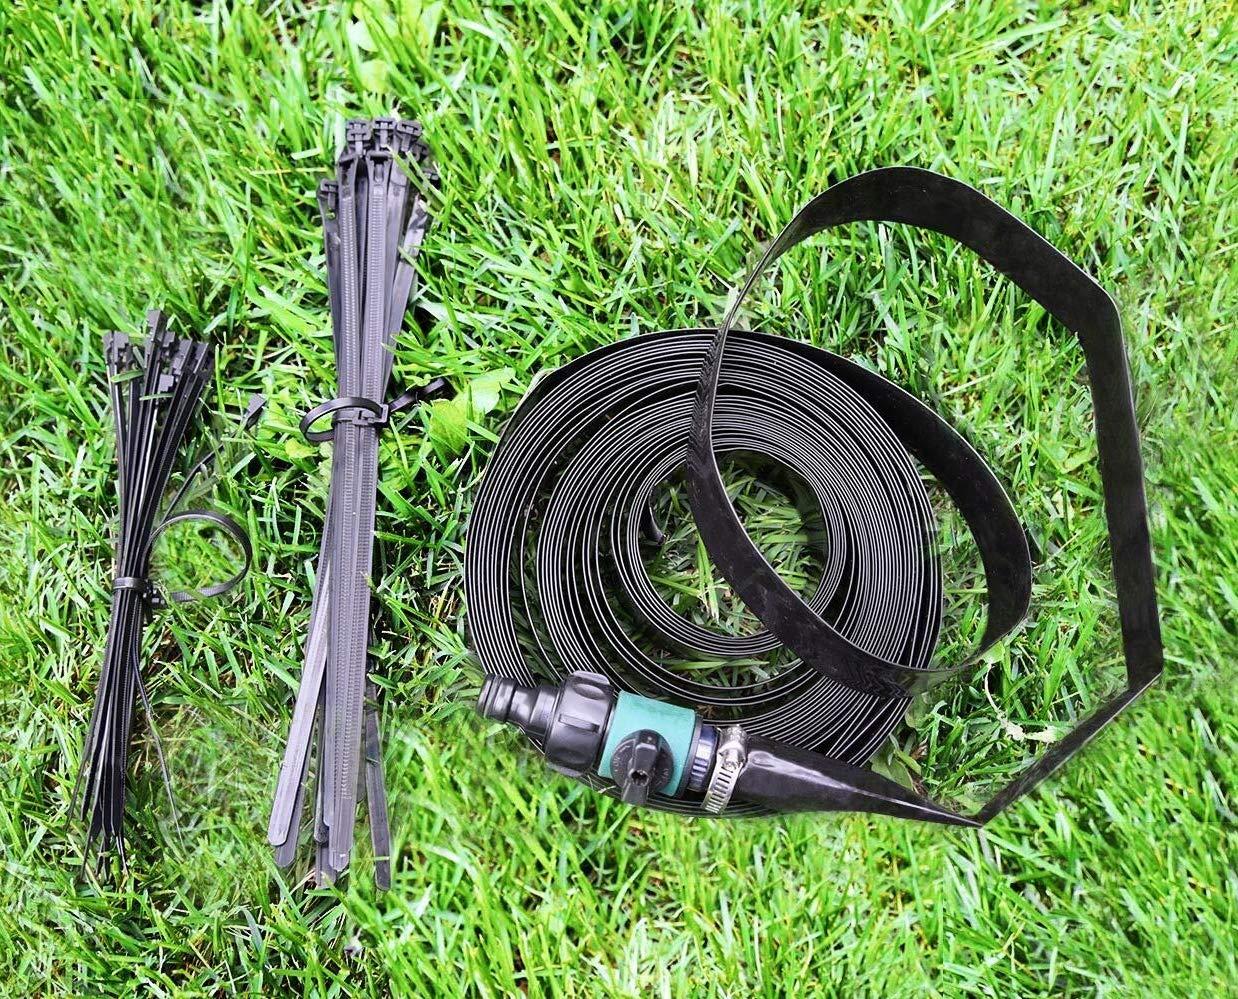 Bobor Trampoline Sprinklers for Kids Outdoor Trampoline Spary Park Fun Summer Water Toys39ft